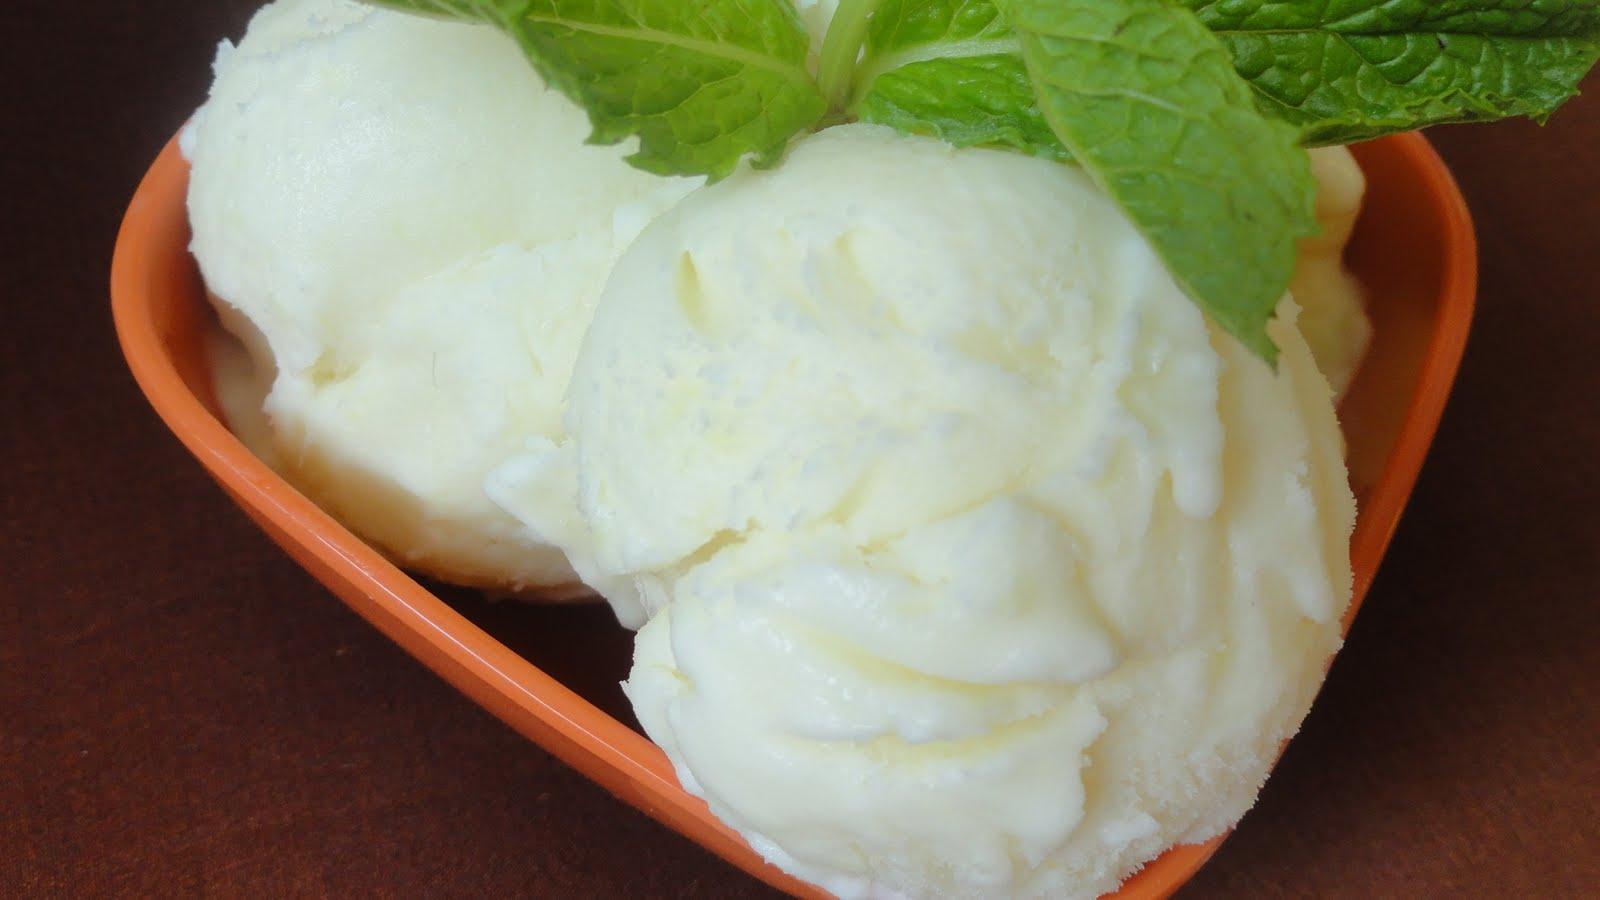 Peek into My Kitchen: Ginger Ice-cream